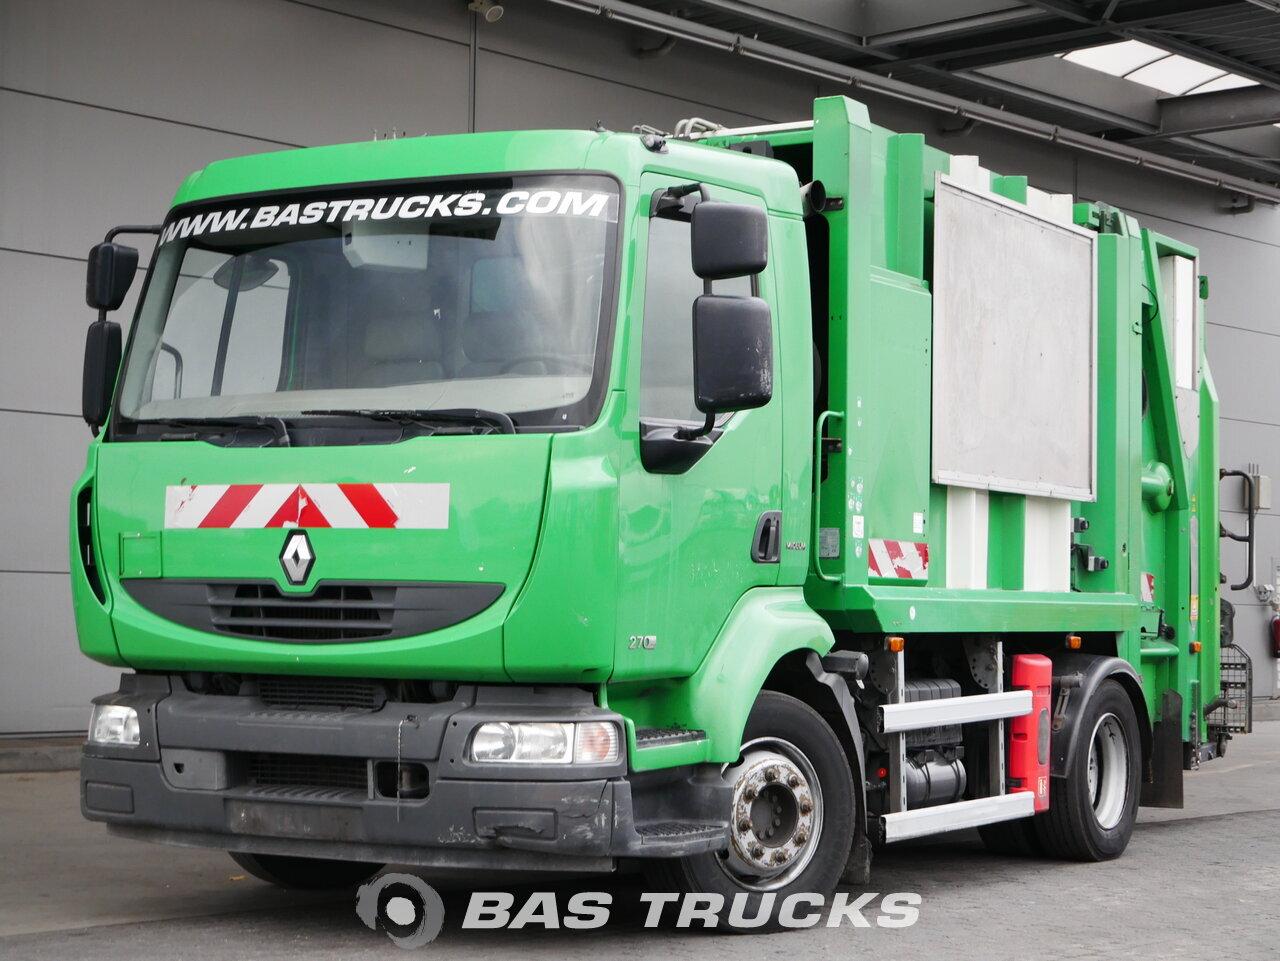 For sale at BAS Trucks: Renault Midlum 270 4X2 06/2010